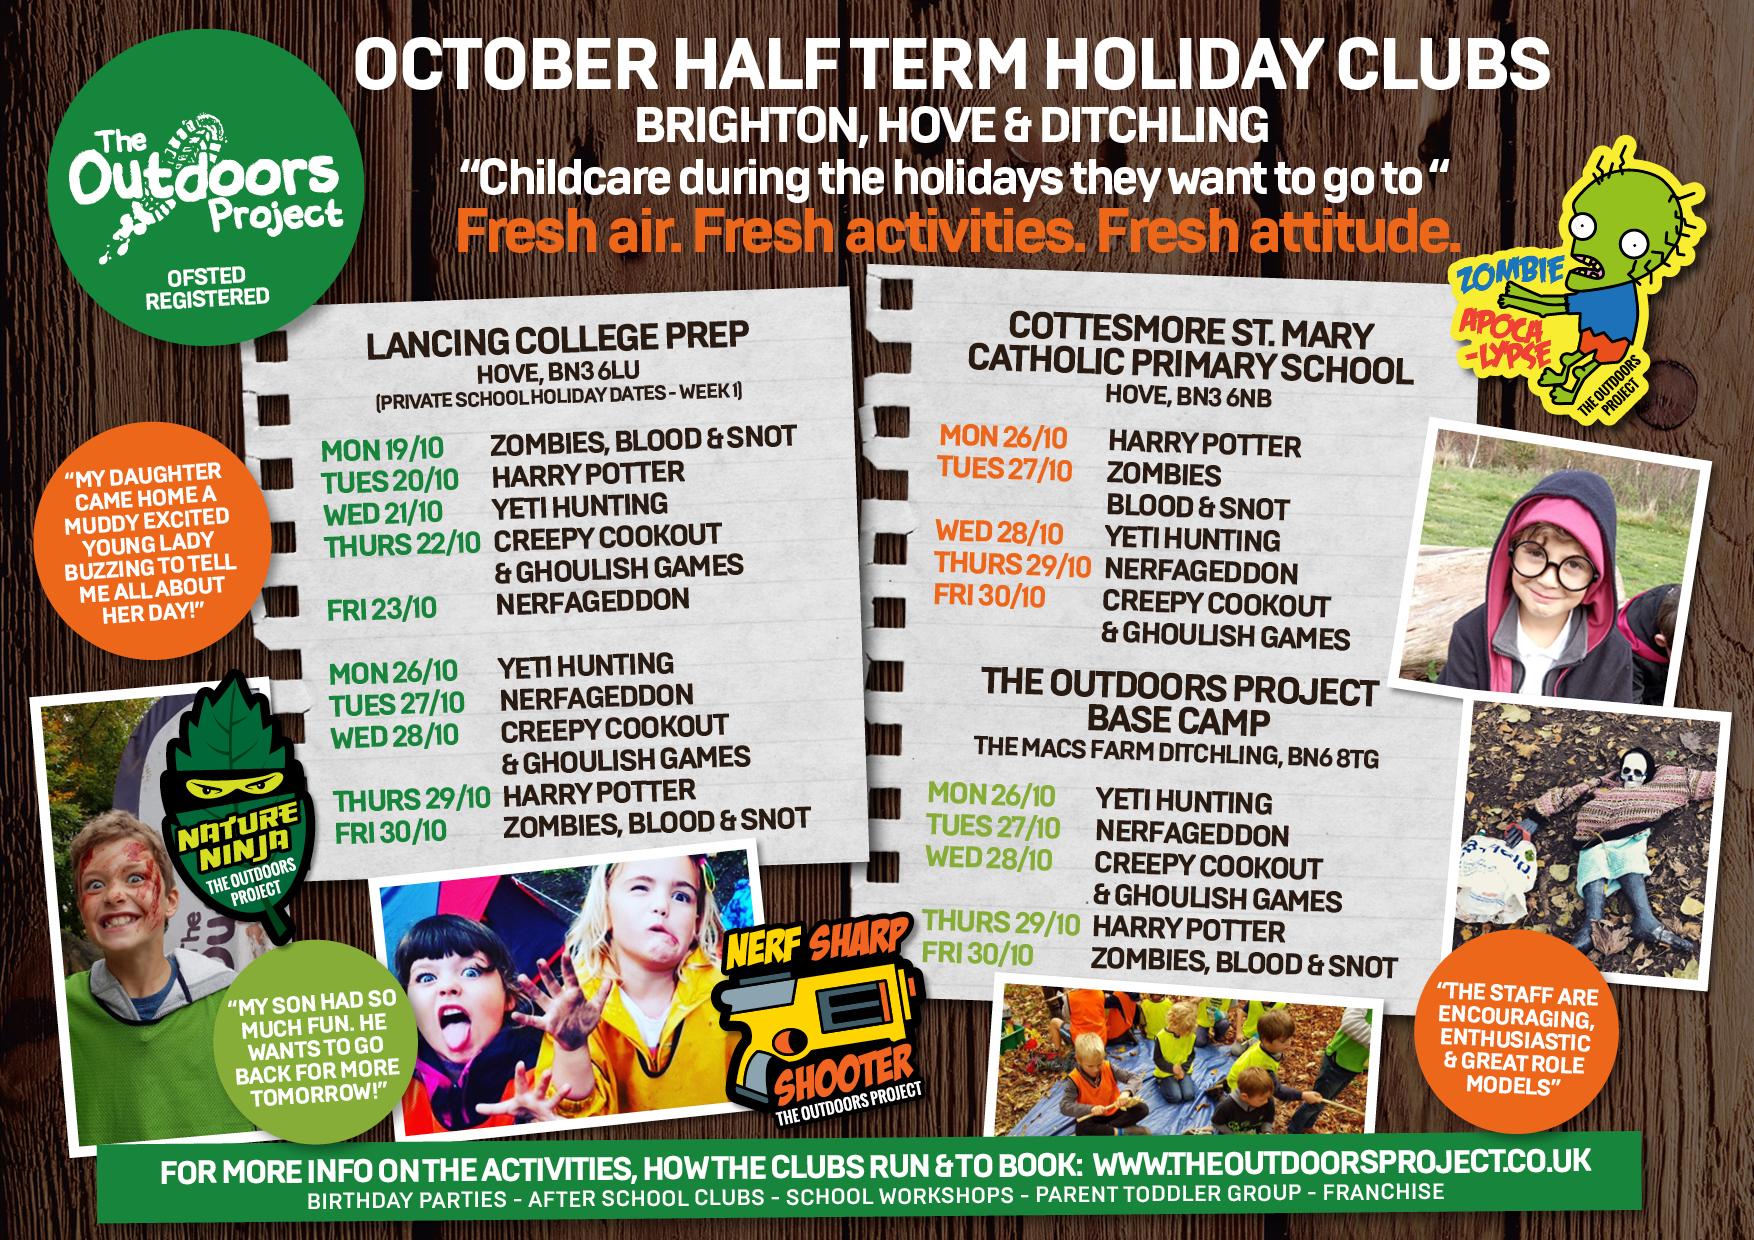 Brighton & Hove October Half Term Holiday Clubs